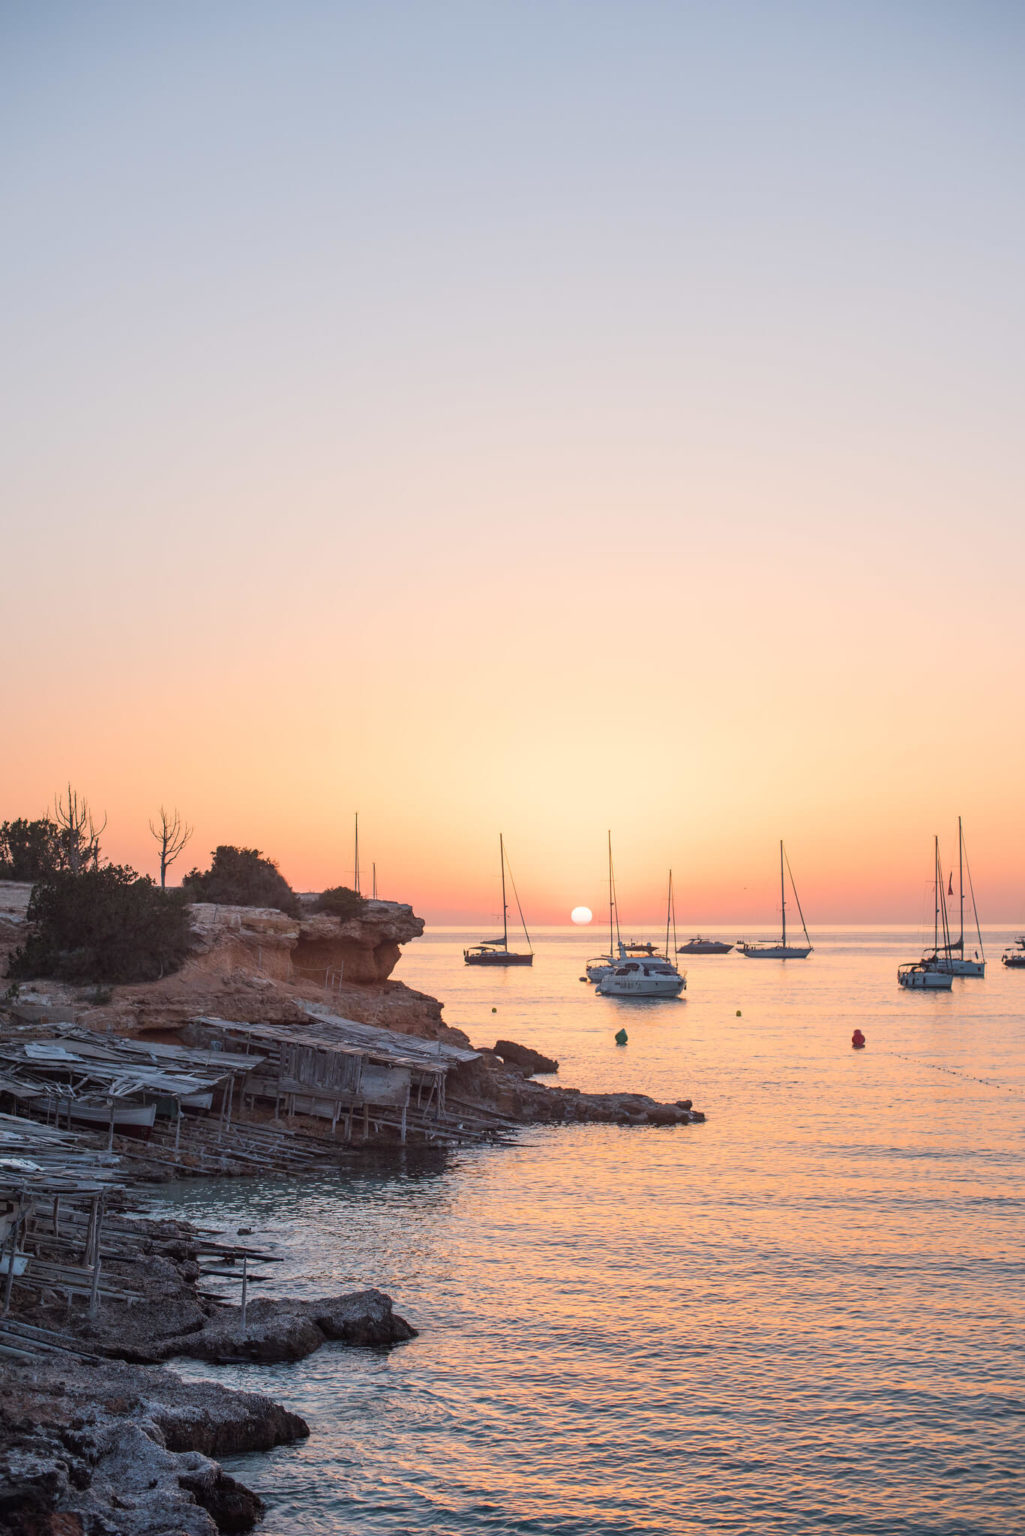 https://www.white-ibiza.com/wp-content/uploads/2020/03/formentera-sunsets-2020-10-1025x1536.jpg